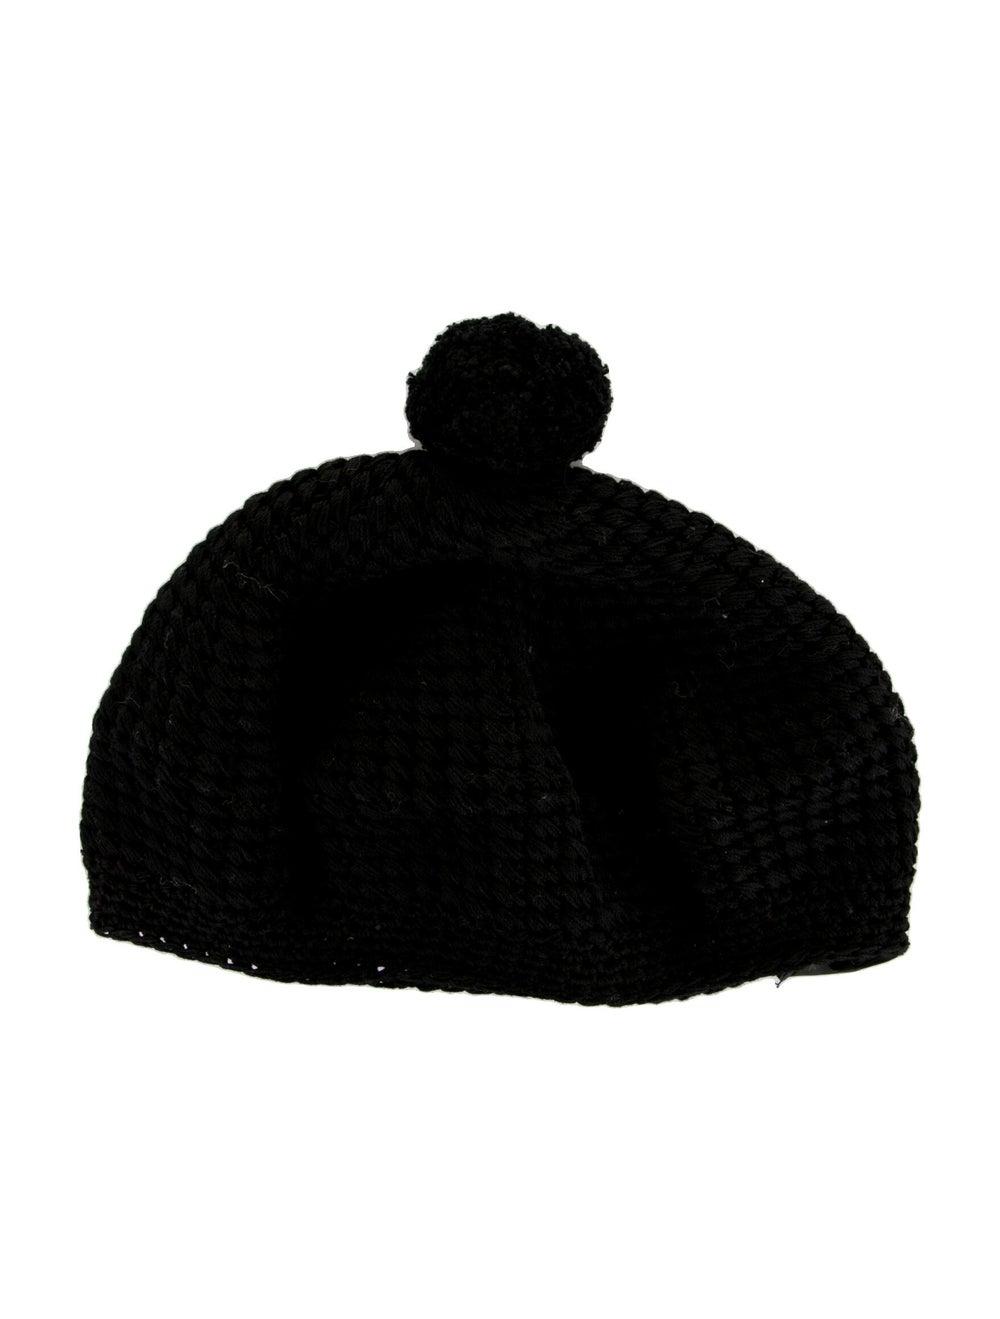 Gucci Knit Pom-Pom Beret Black - image 2